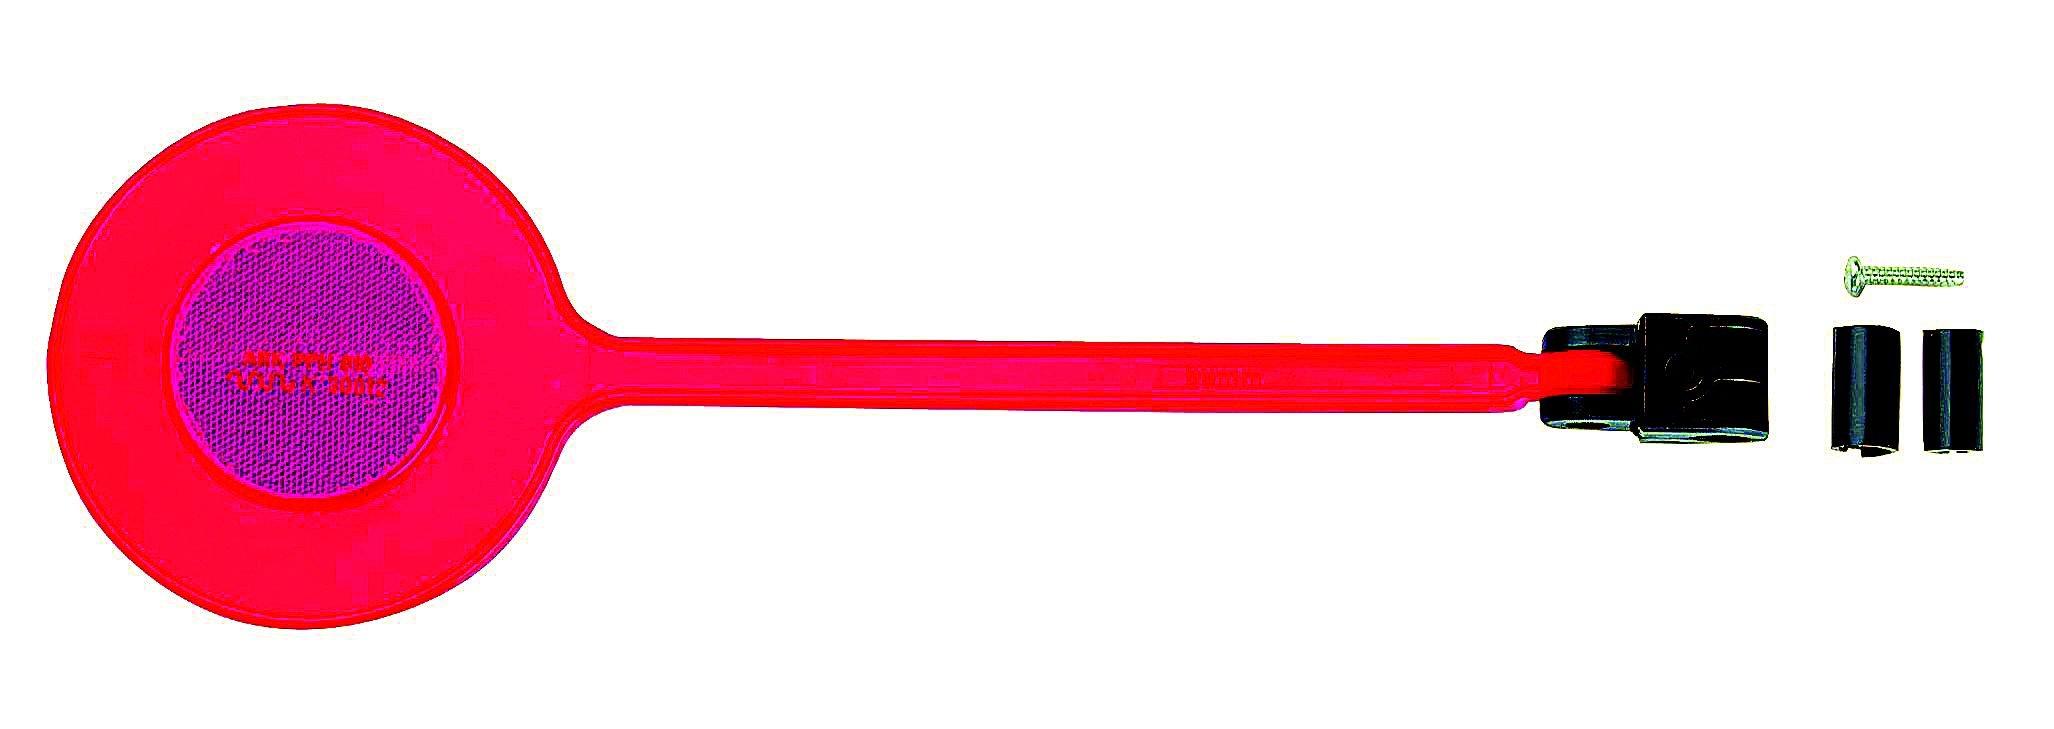 reflektoren/Beleuchtung: Busch & Müller  317 Abstandhalter  320mm